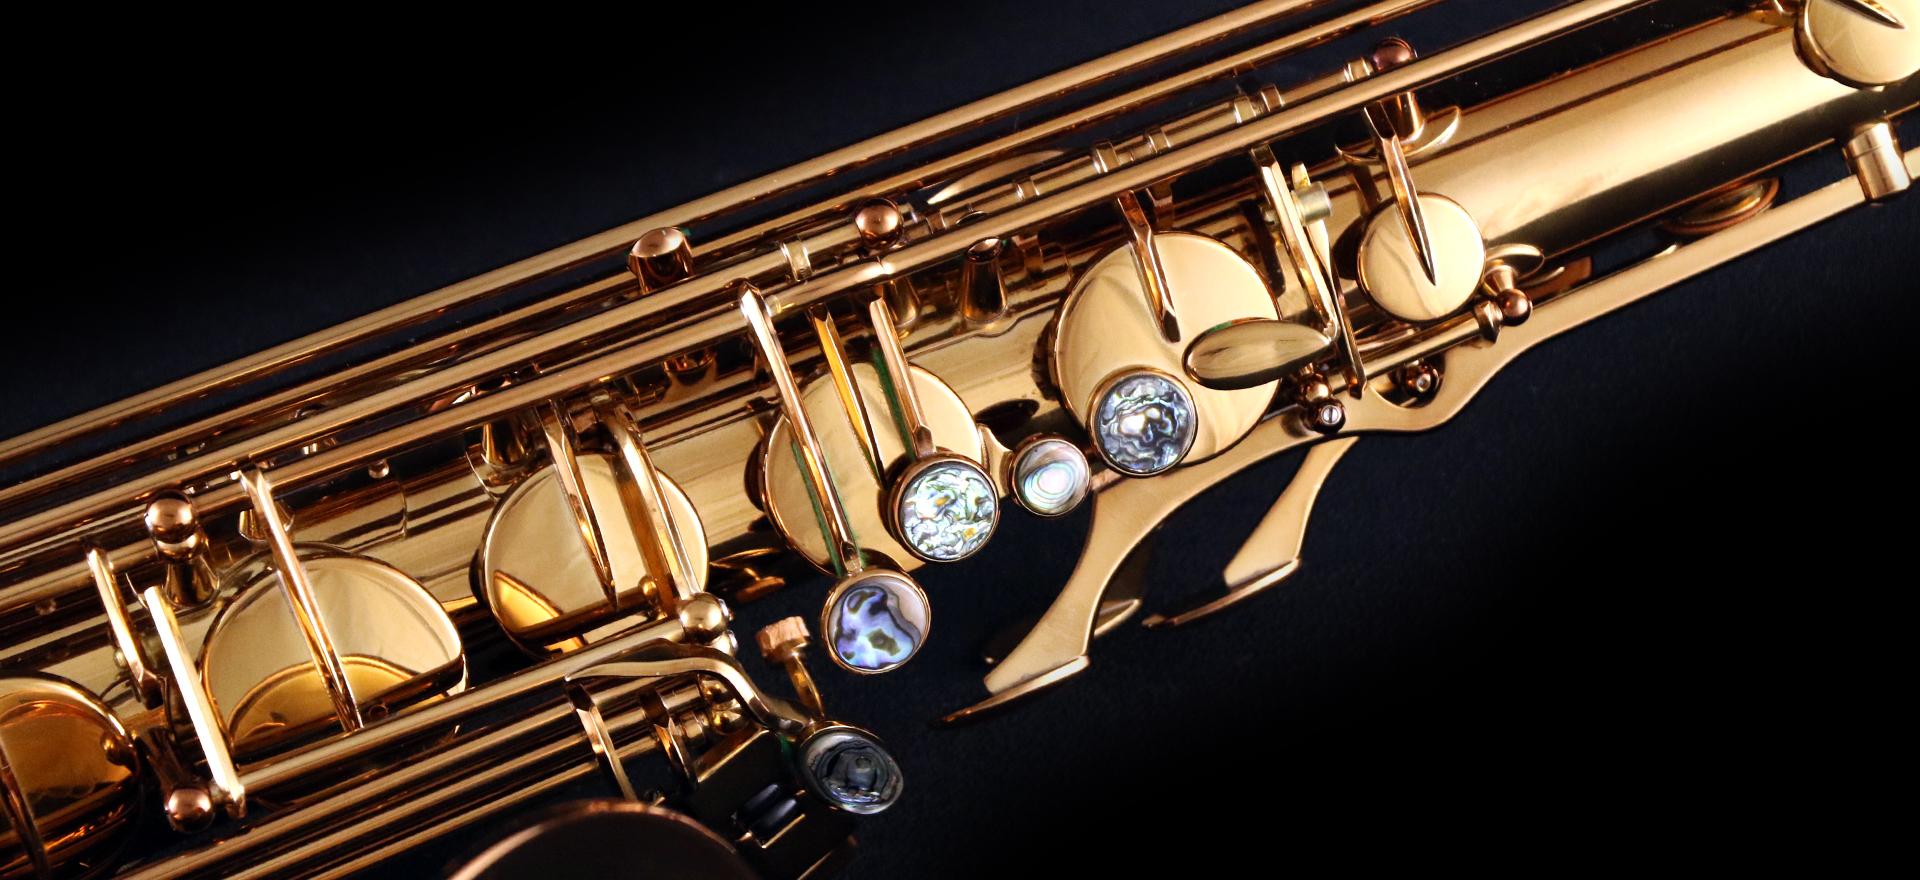 FIND YOUR SOUND. Saxophone photo.